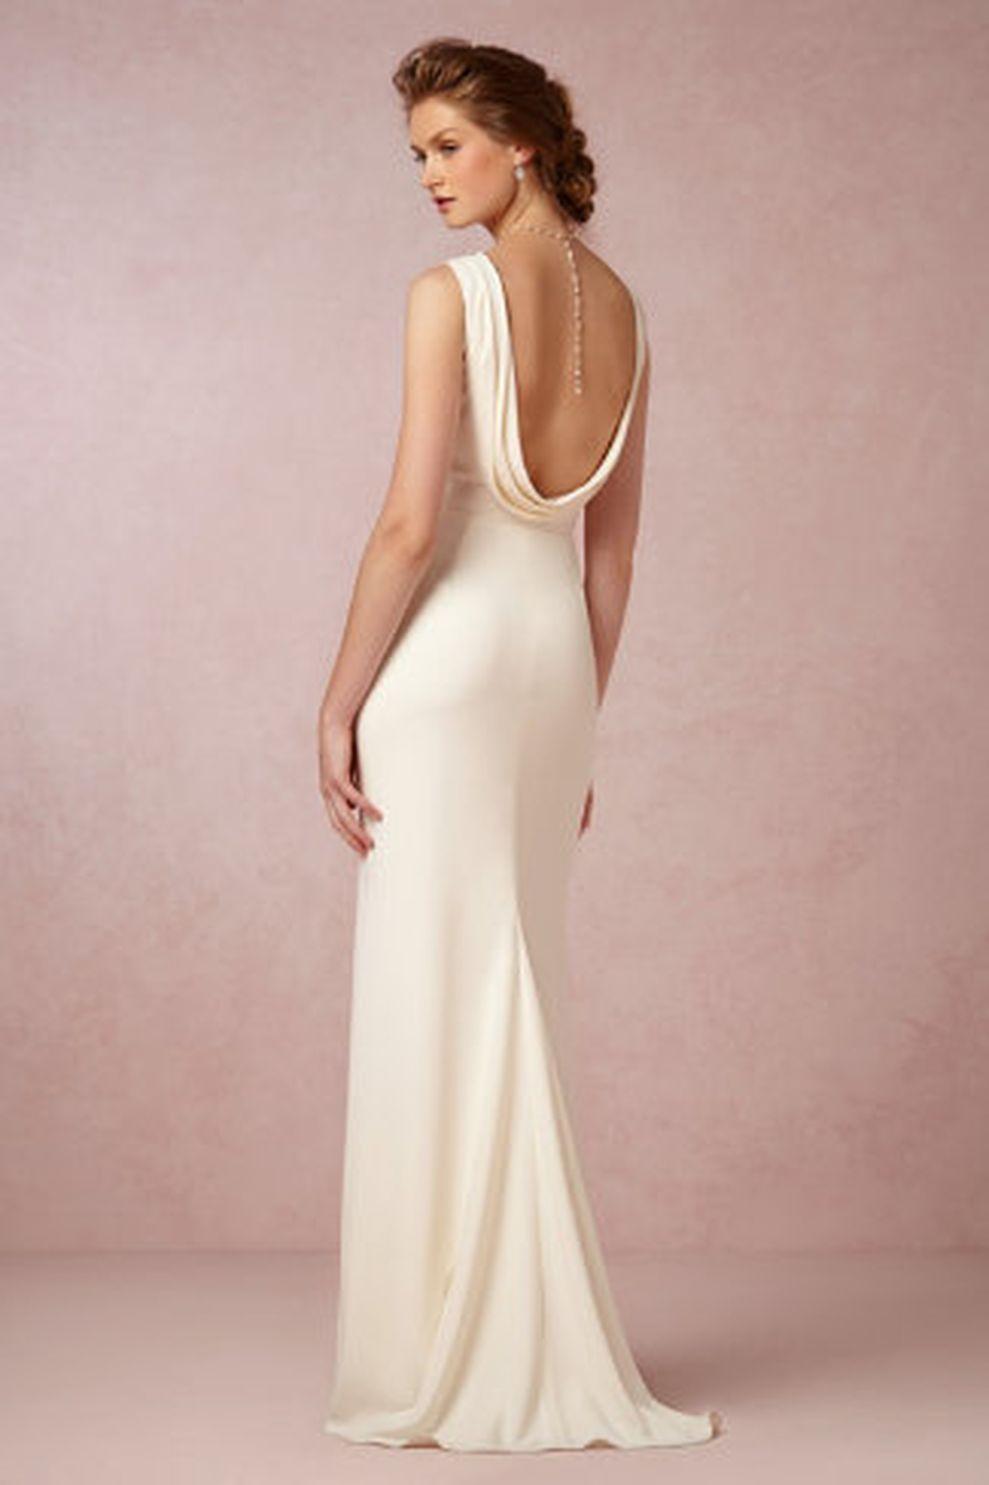 Cheap casual wedding dresses   Elegant Vineyard Wedding Dresses Ideas Perfect for Casual